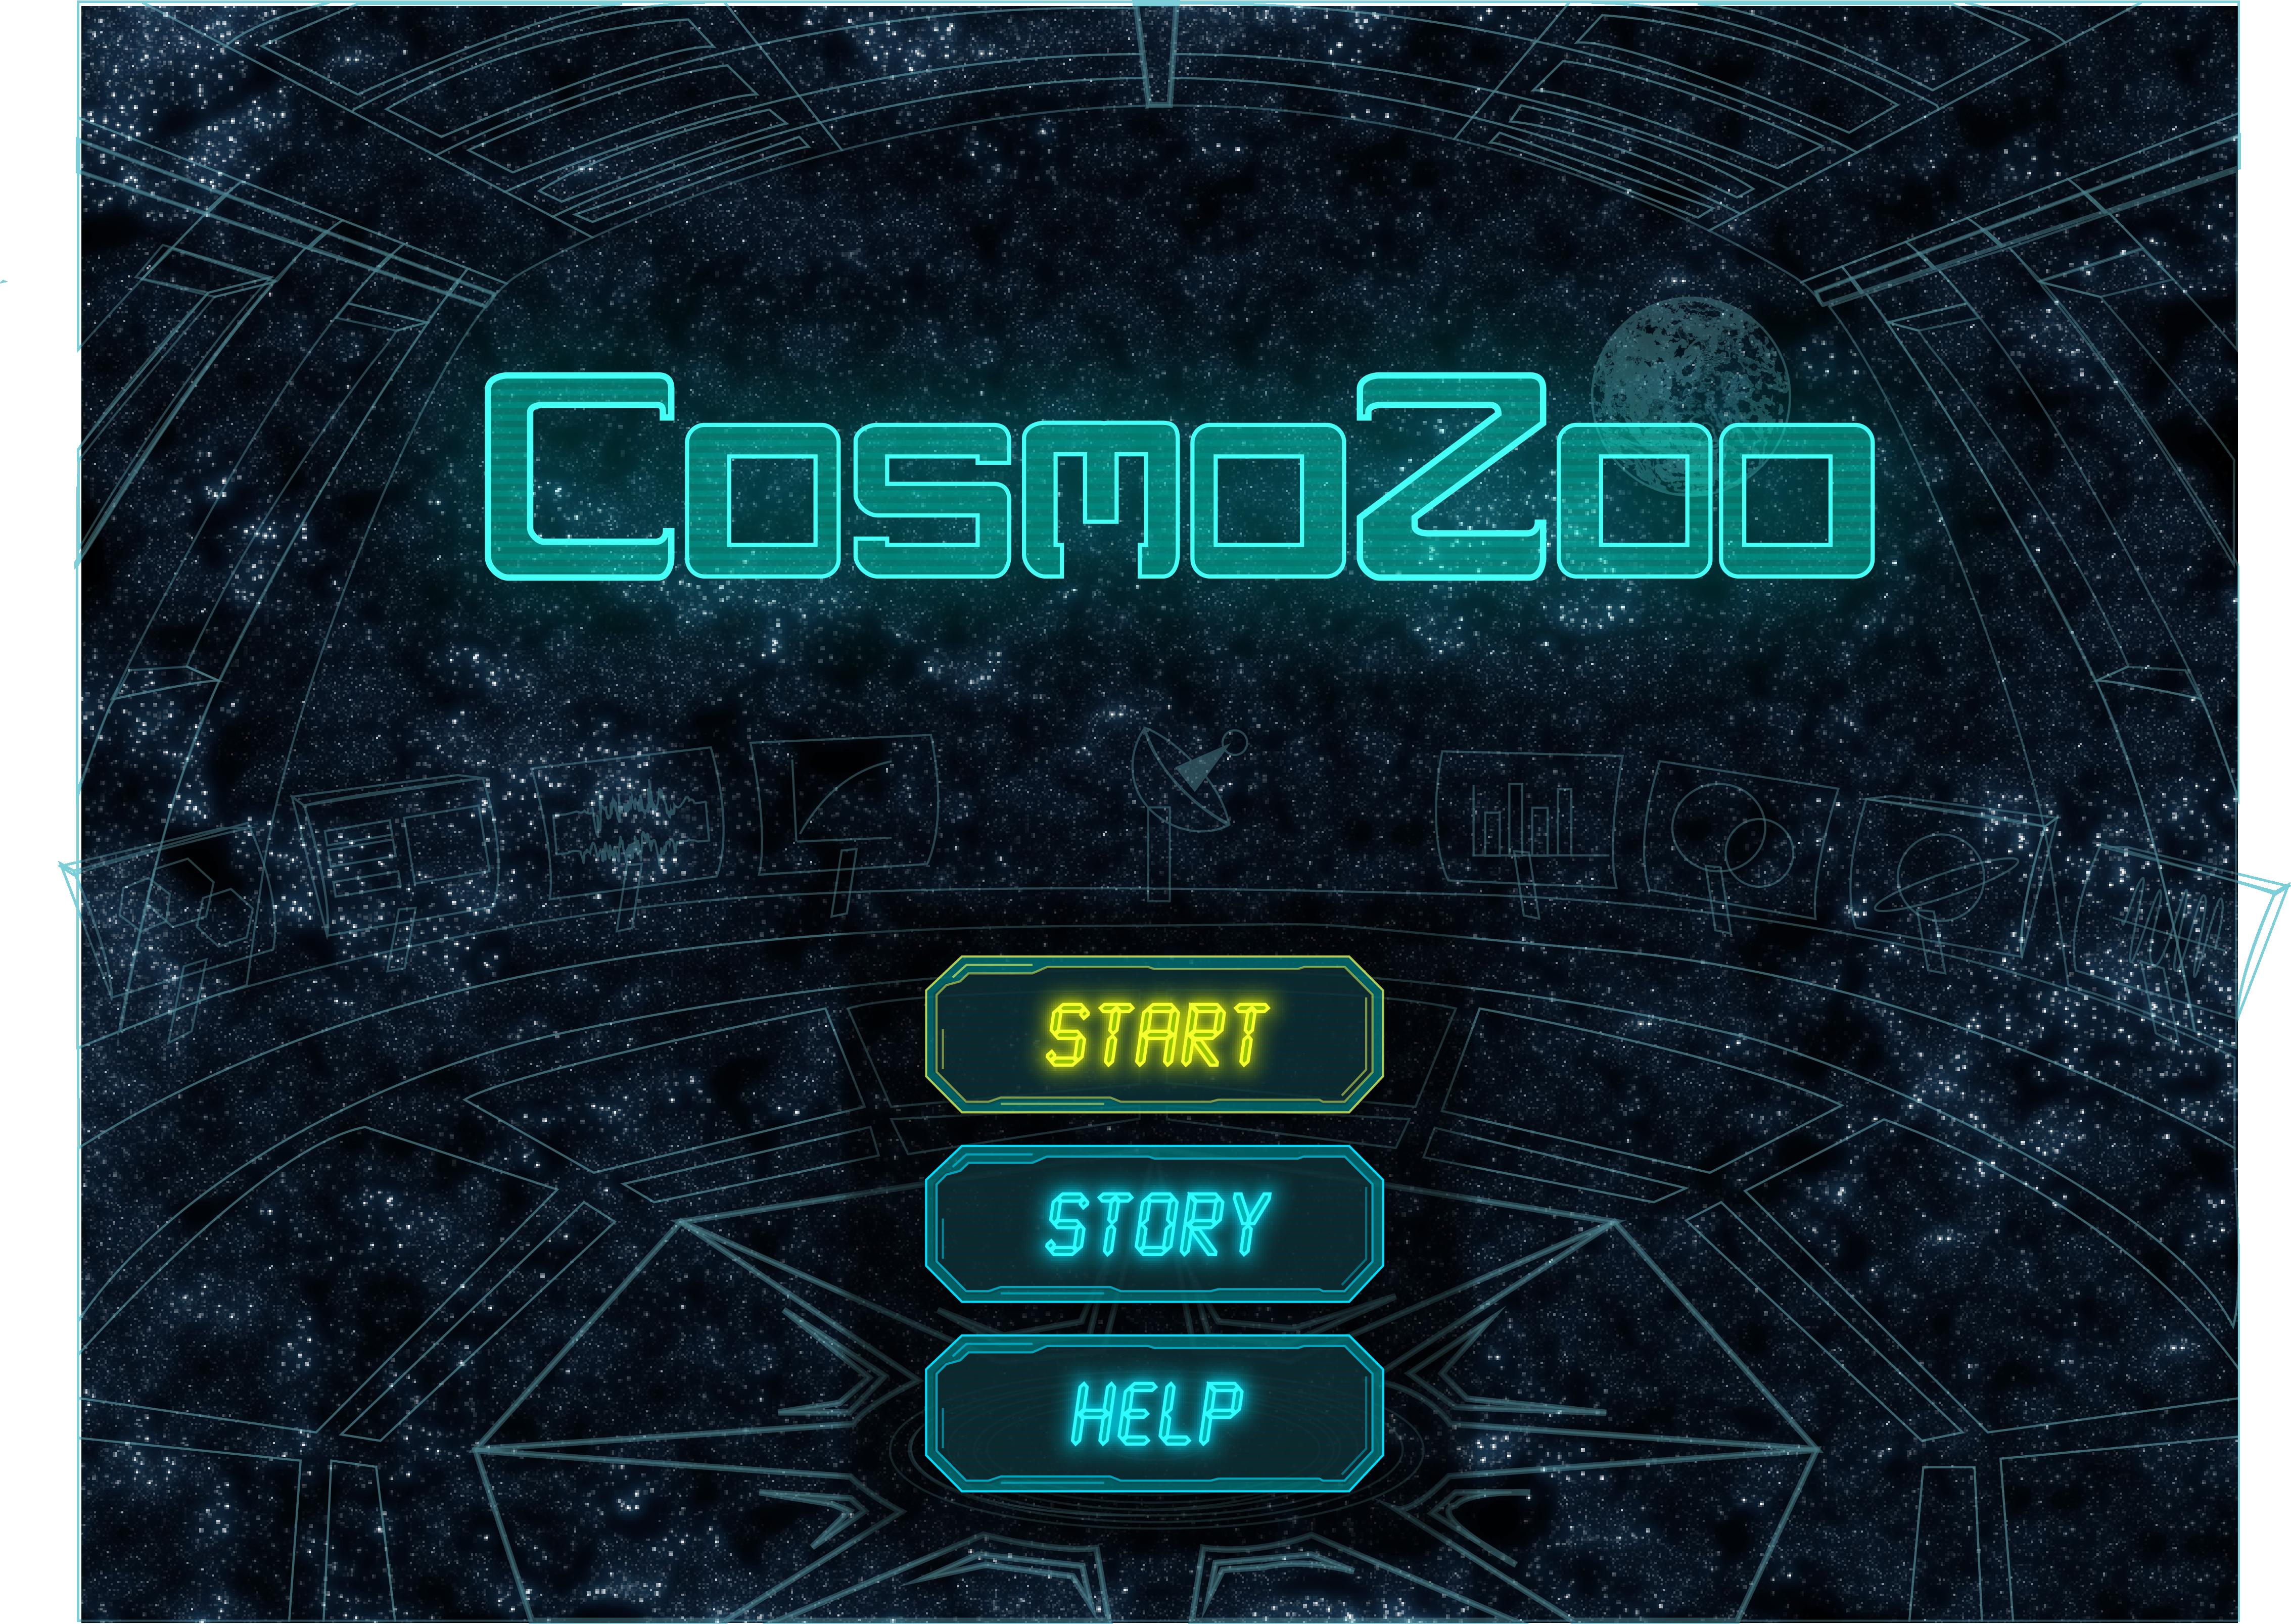 CosmoZoo Start Screen